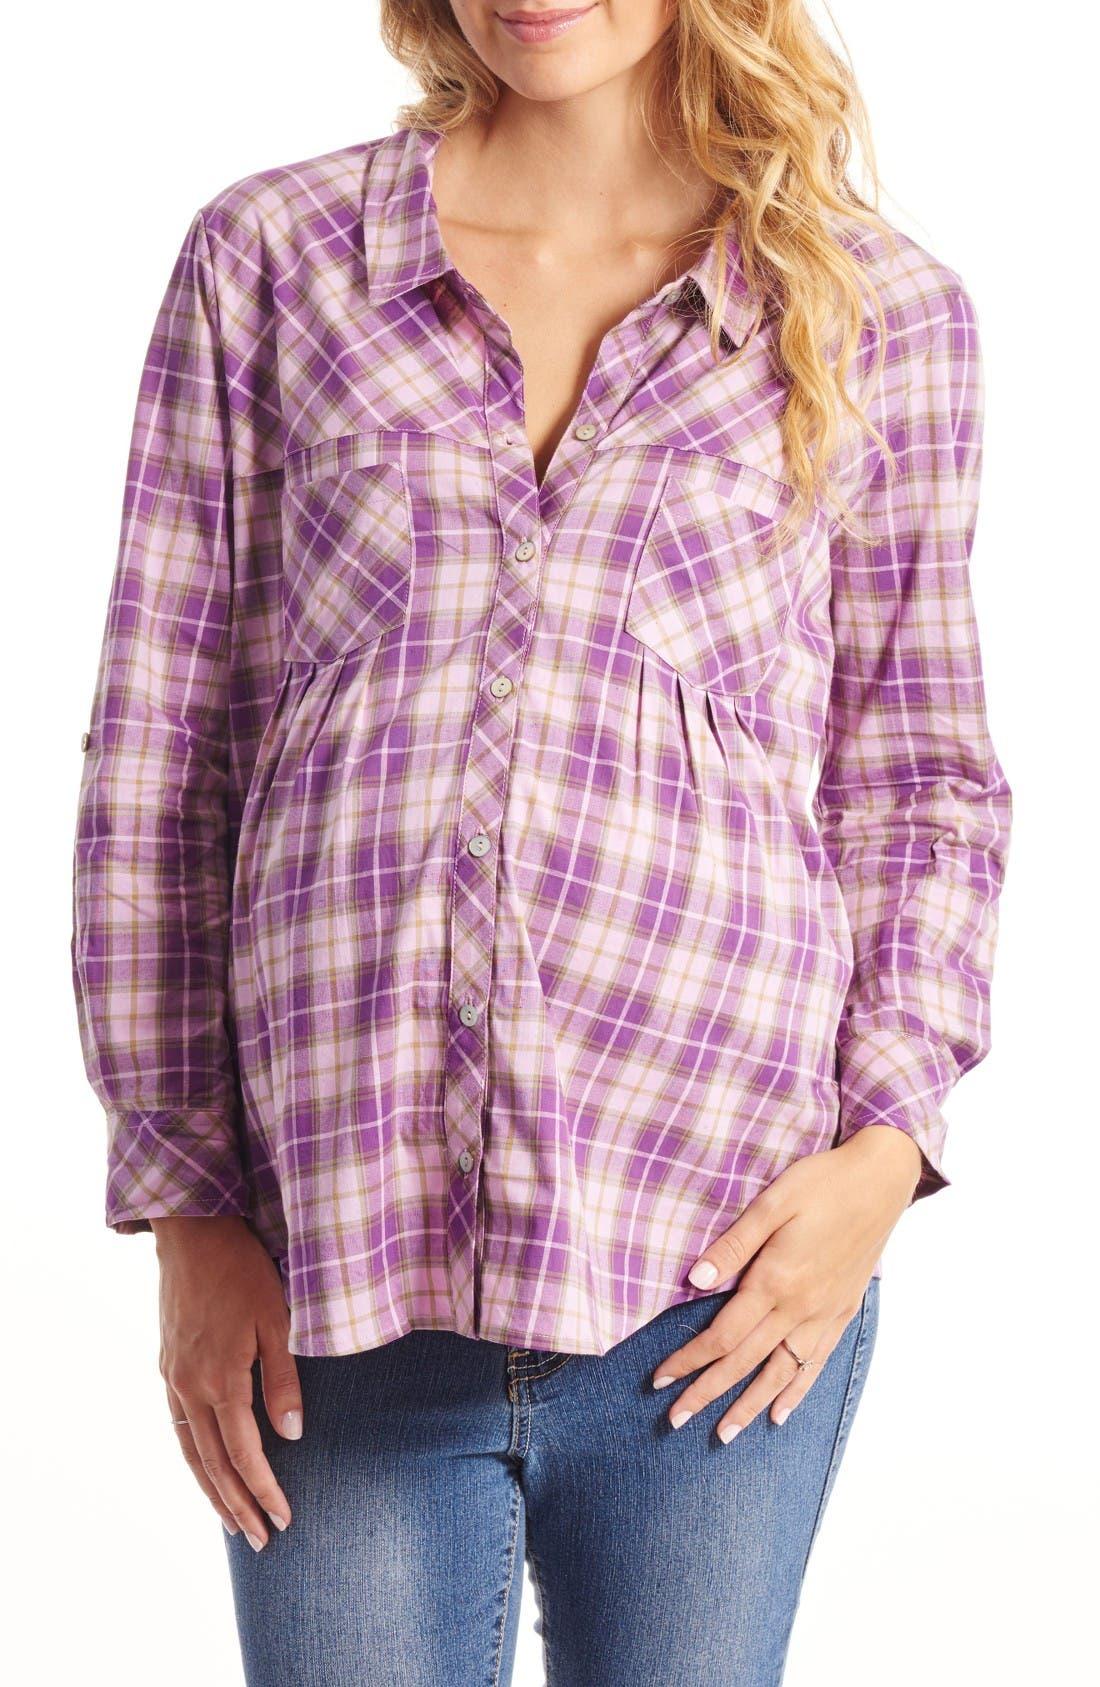 Everly Grey 'Batina' Maternity Shirt